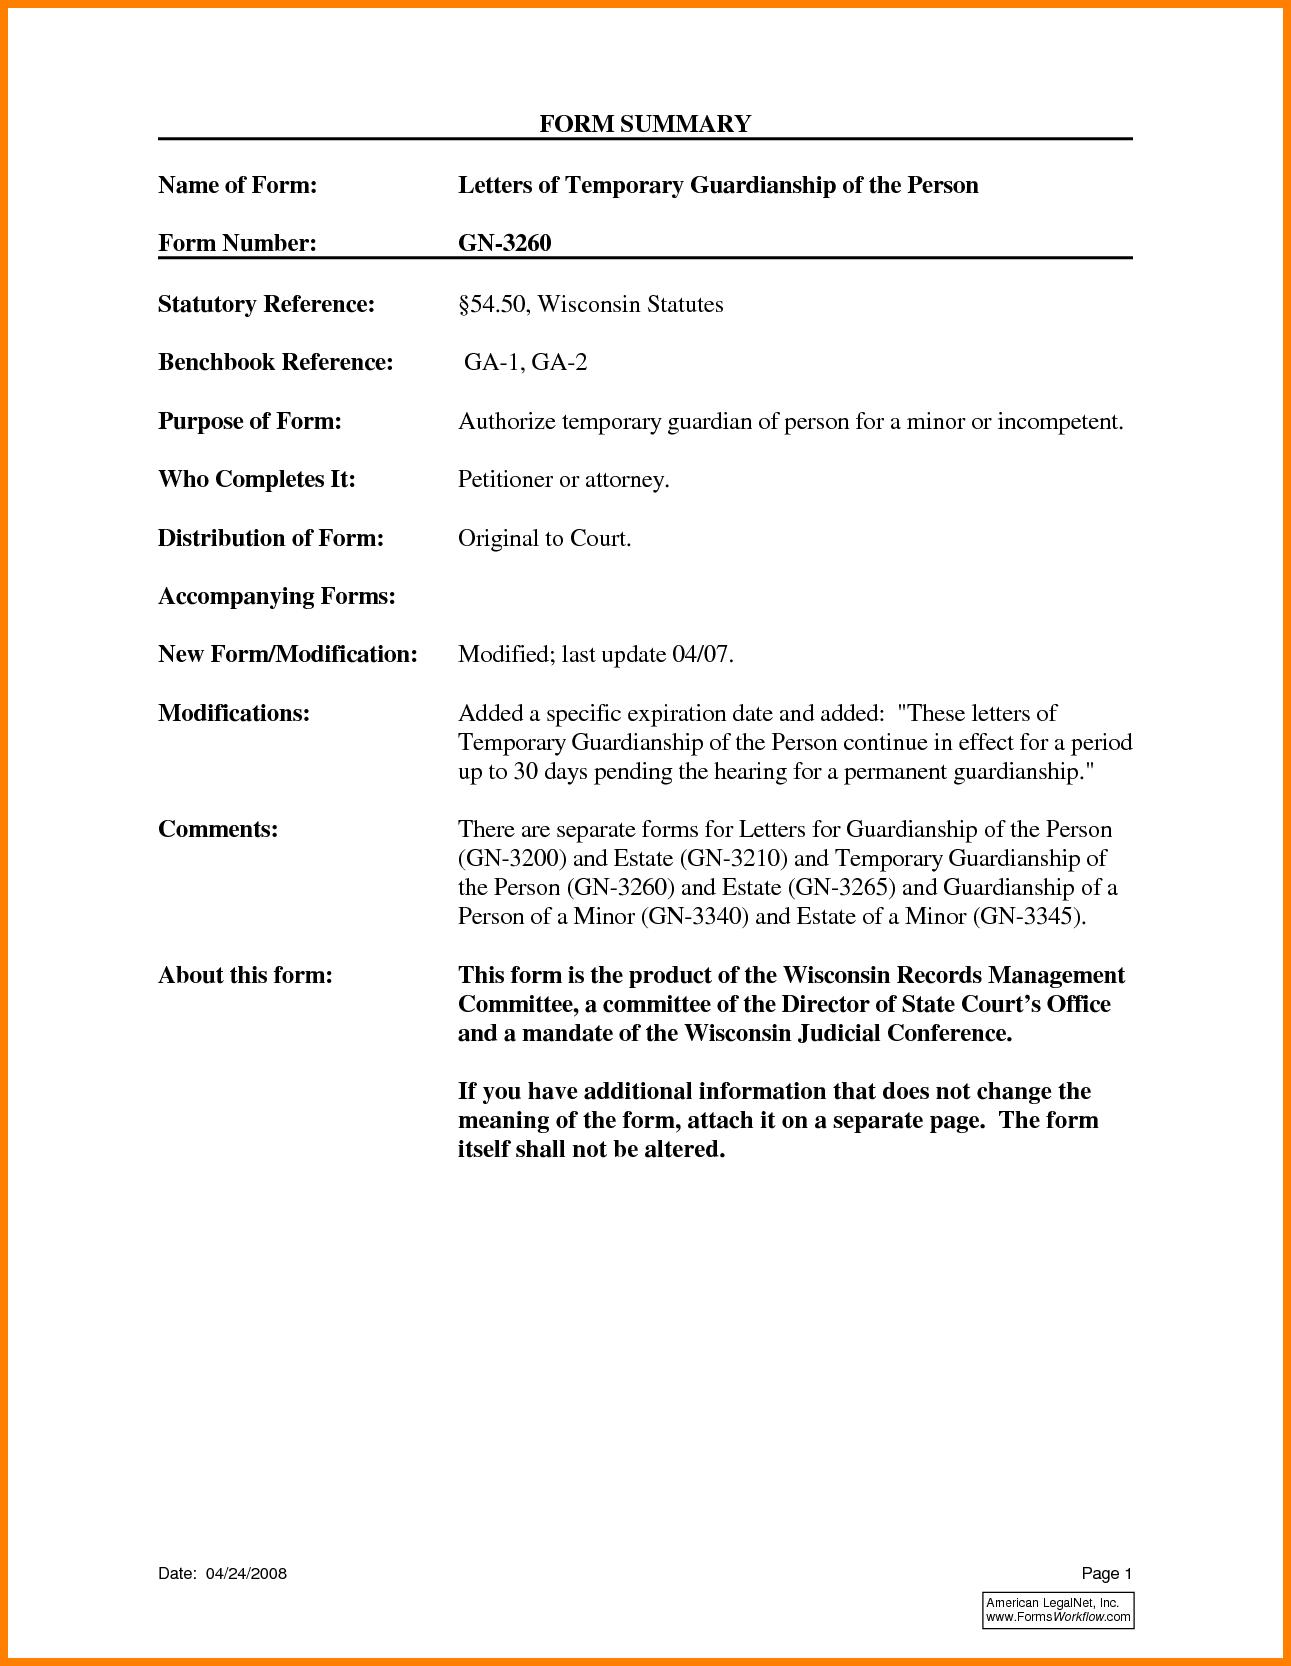 Temporary Custody Letter Template - Temporary Custody Letter Template Entertaining Best 25 Ficial Letter